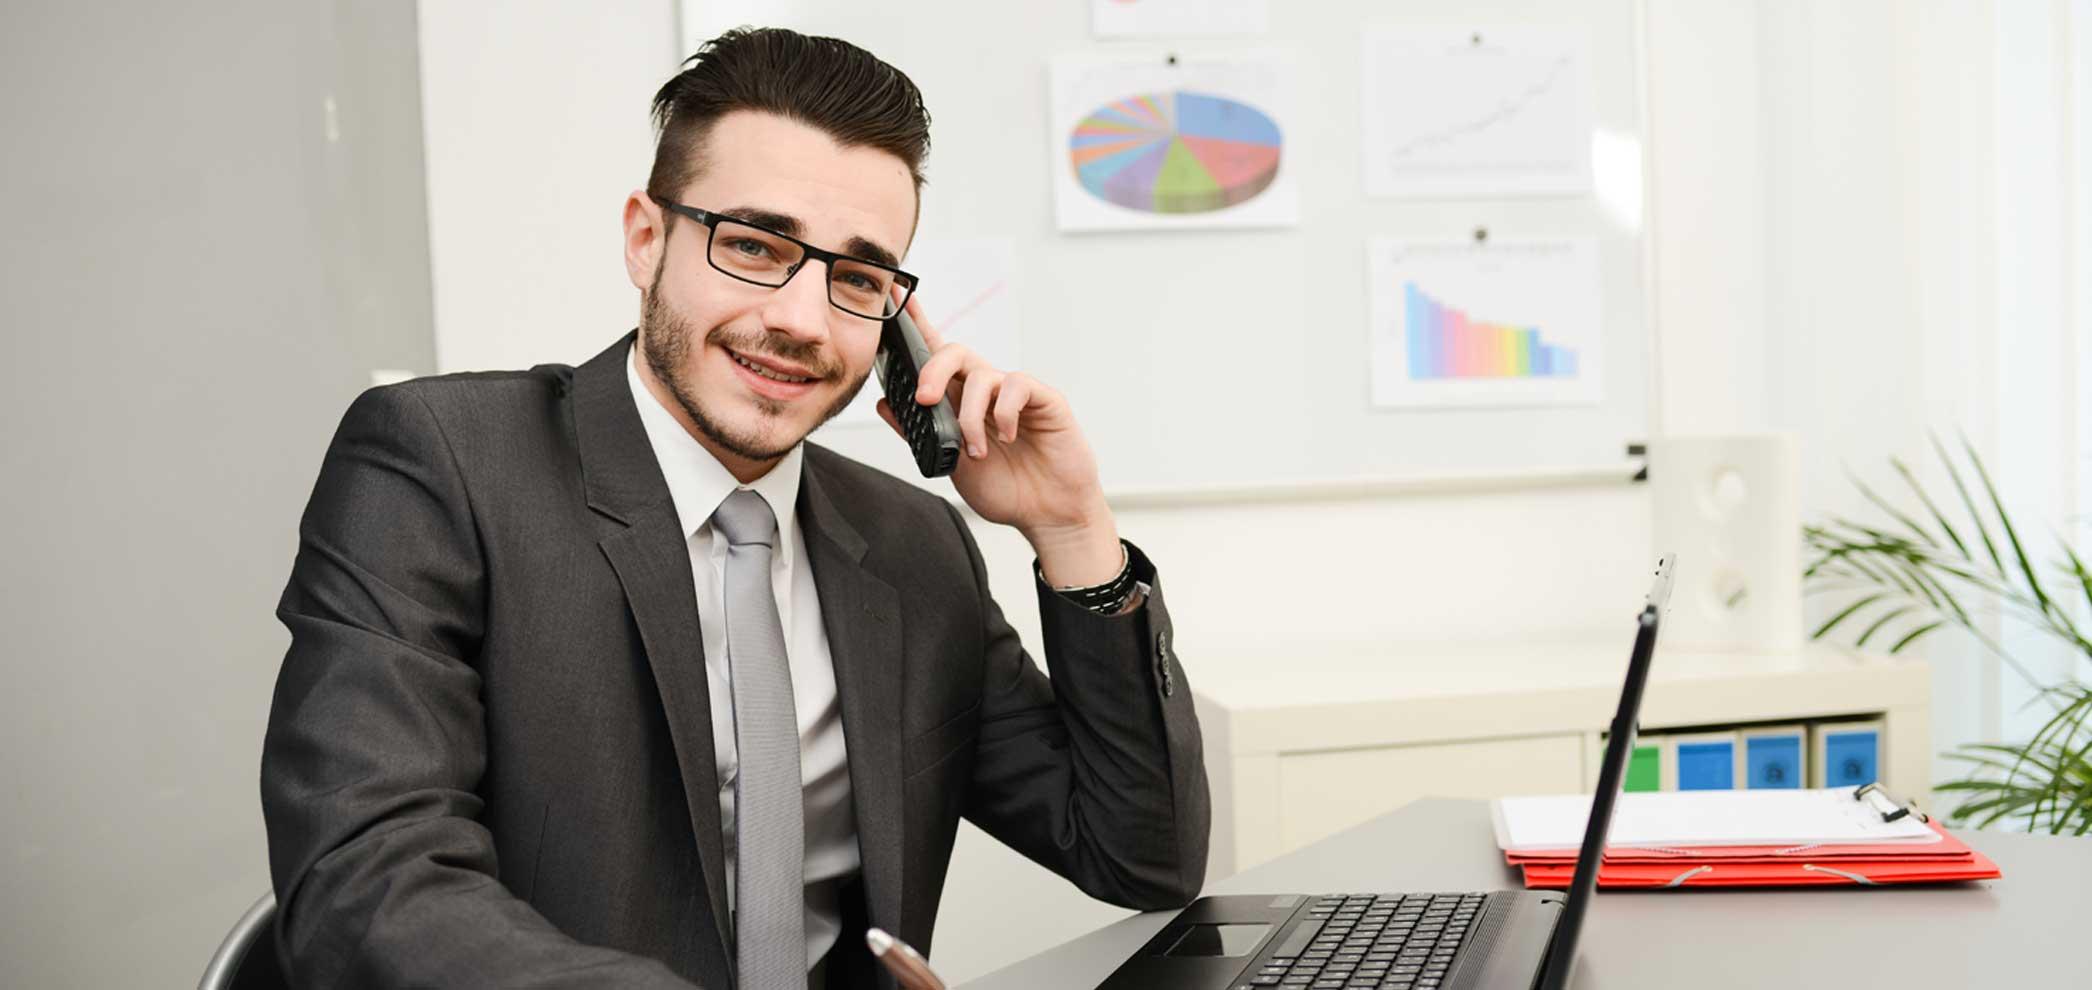 Business Program at Pennsylvanina PennCommercial